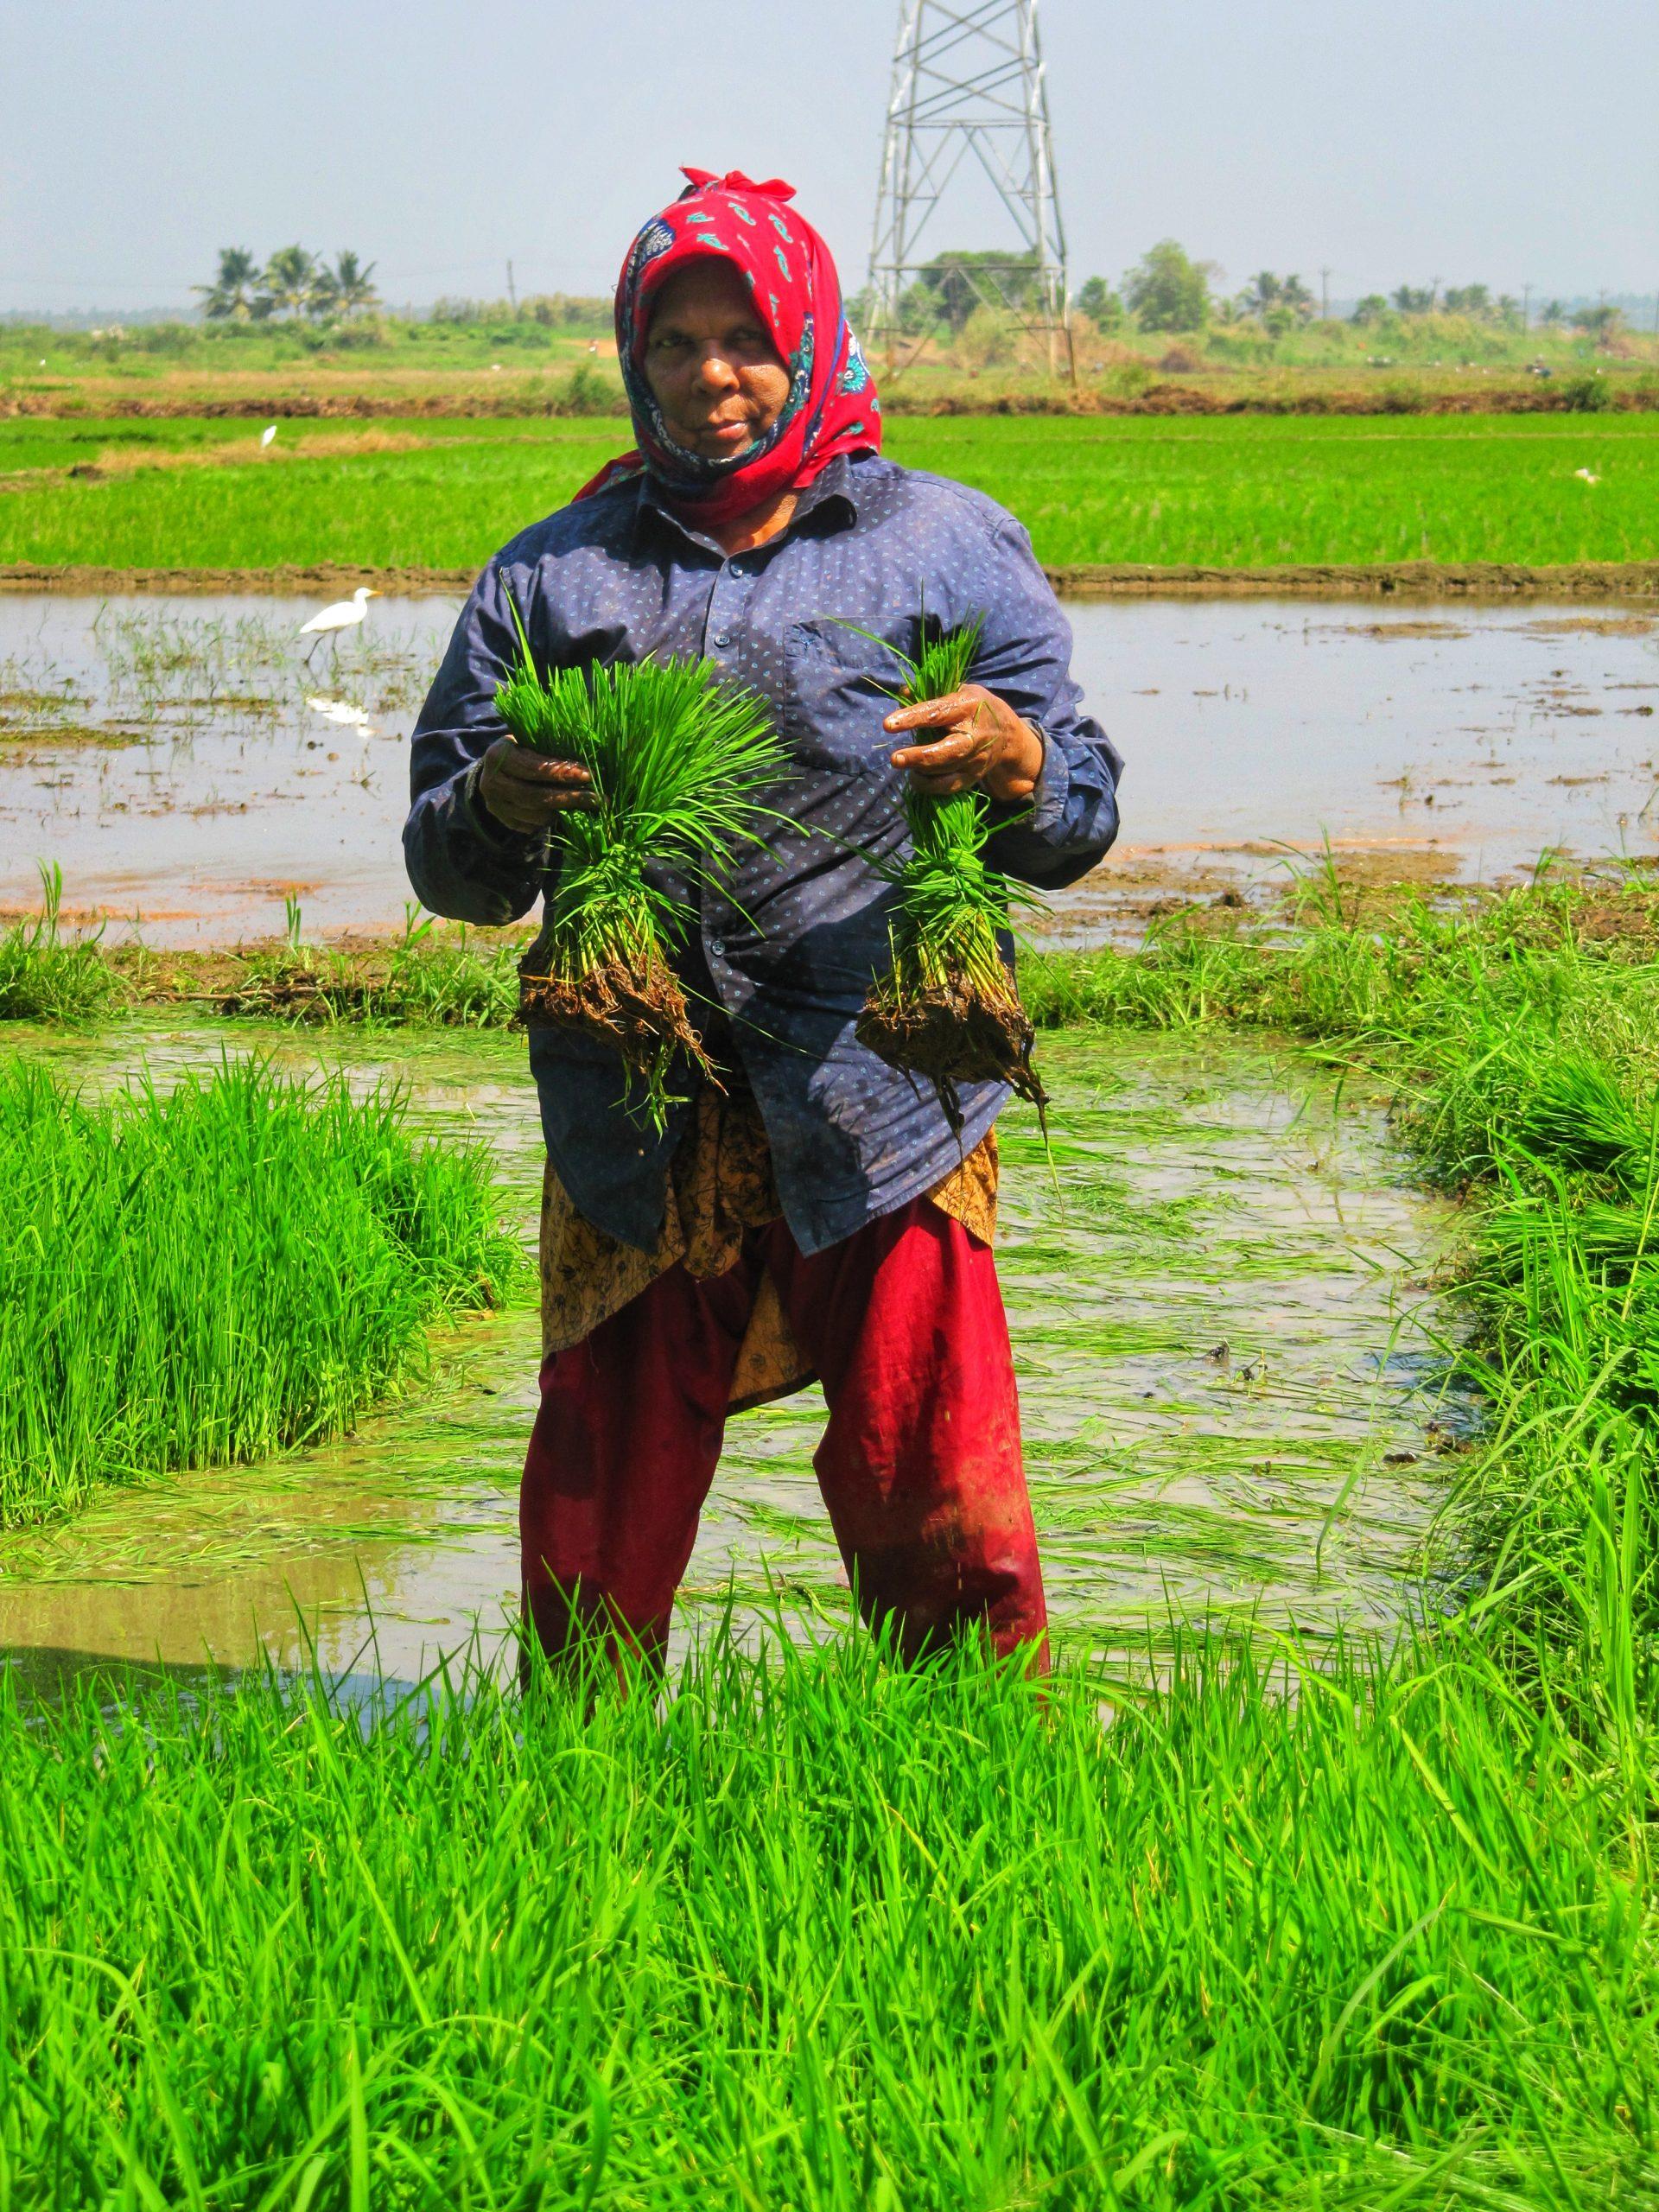 A farmer in a paddy field